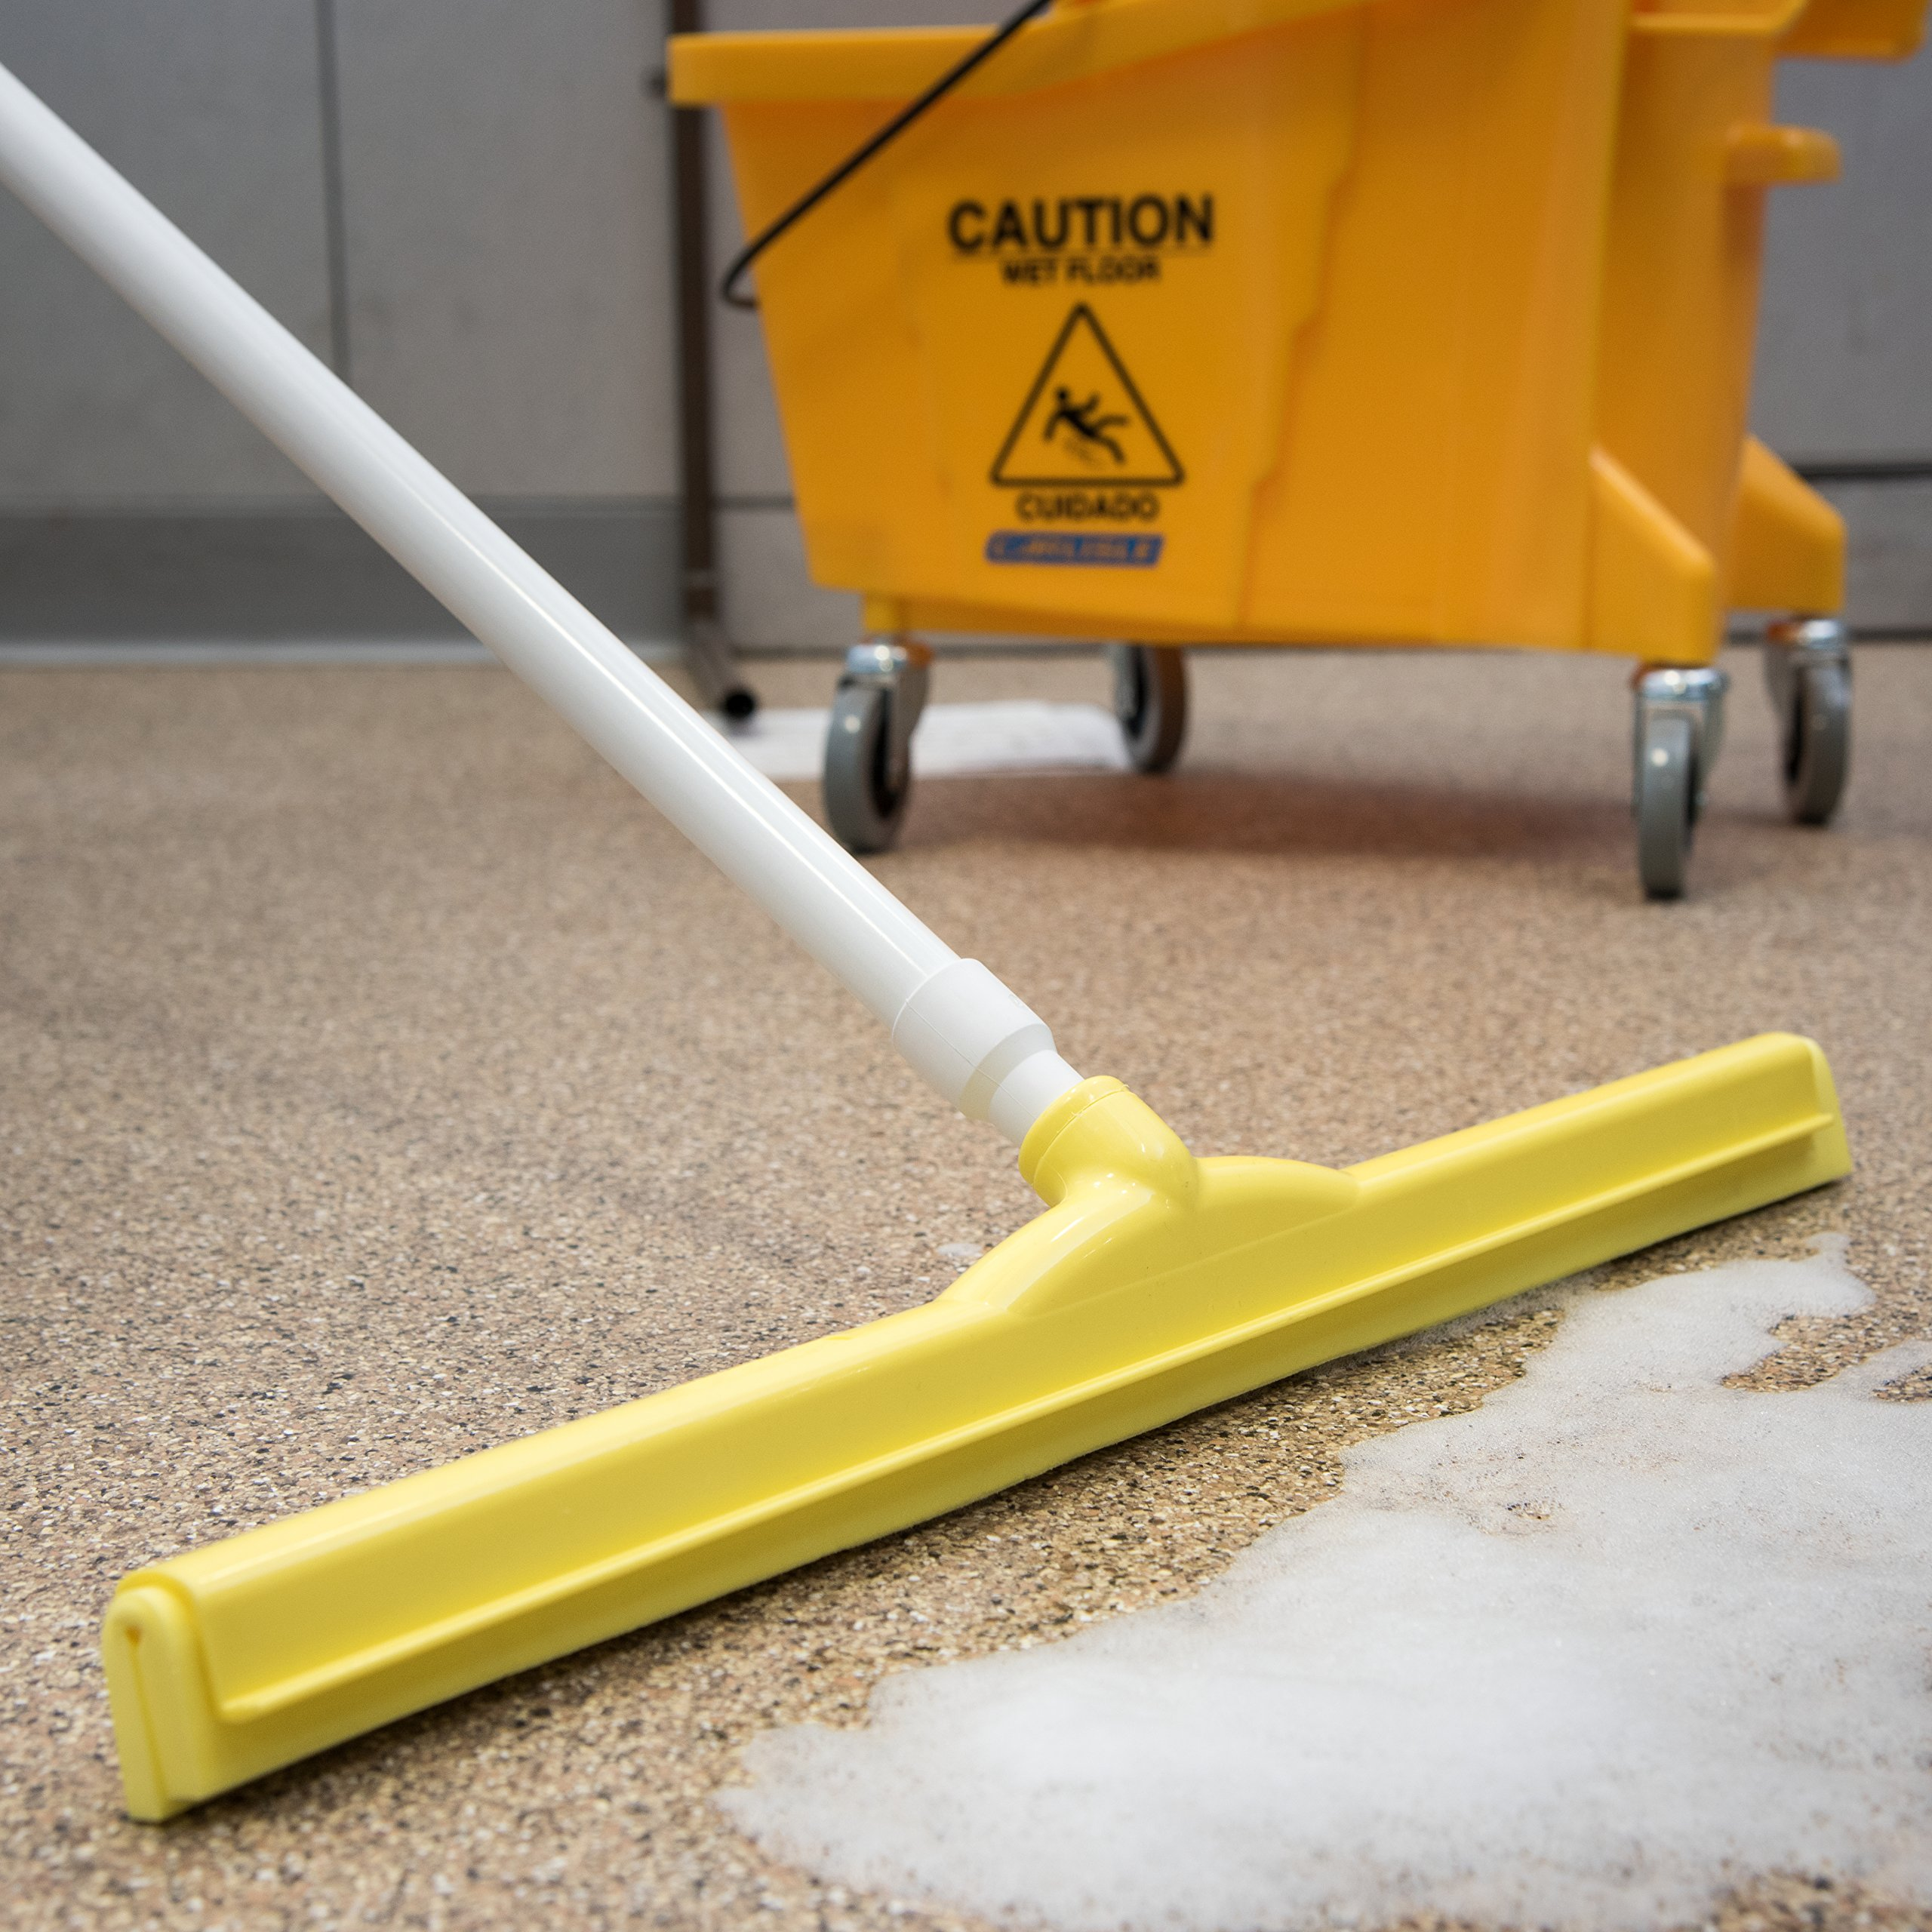 Carlisle 4156804 Spectrum Double Foam Rubber Floor Squeegee, 24'' Width, Yellow (Case of 6) by Carlisle (Image #5)